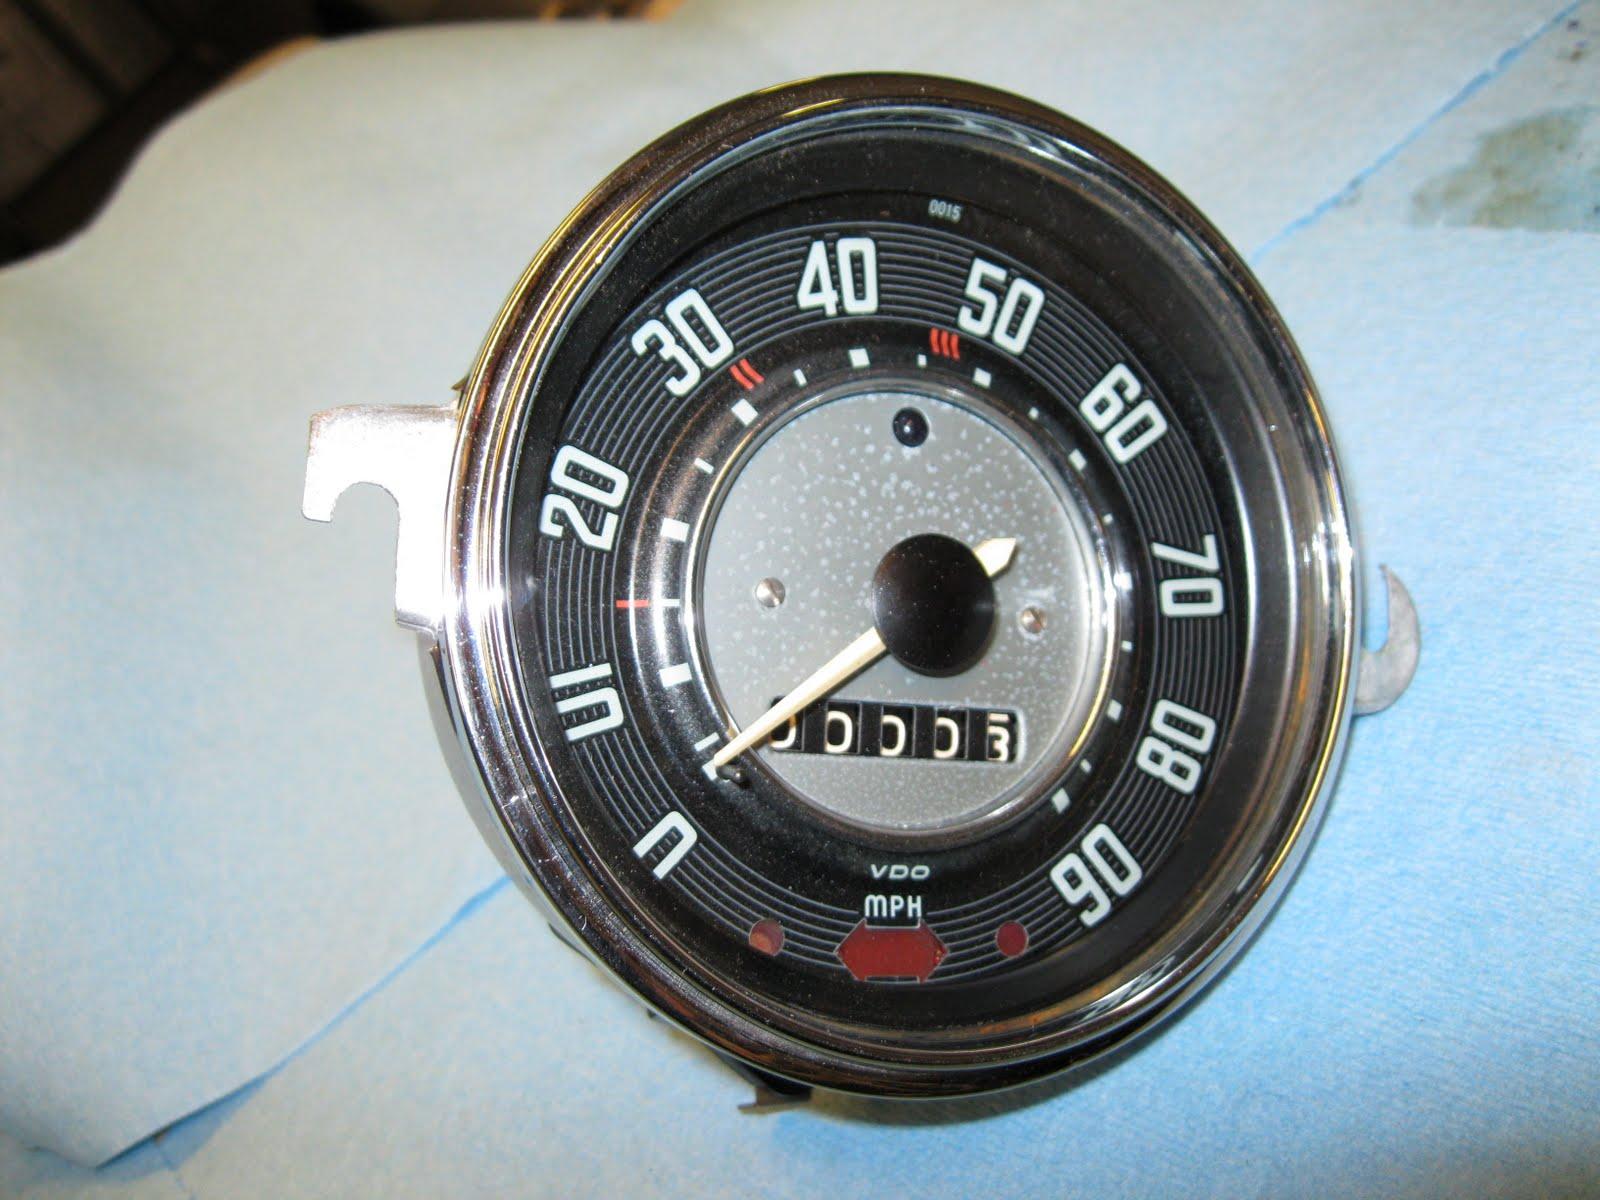 Vdo Speedometer Wiring Diagram Milage On Top Schematics Auto Gauge Beautiful Meter Electronic